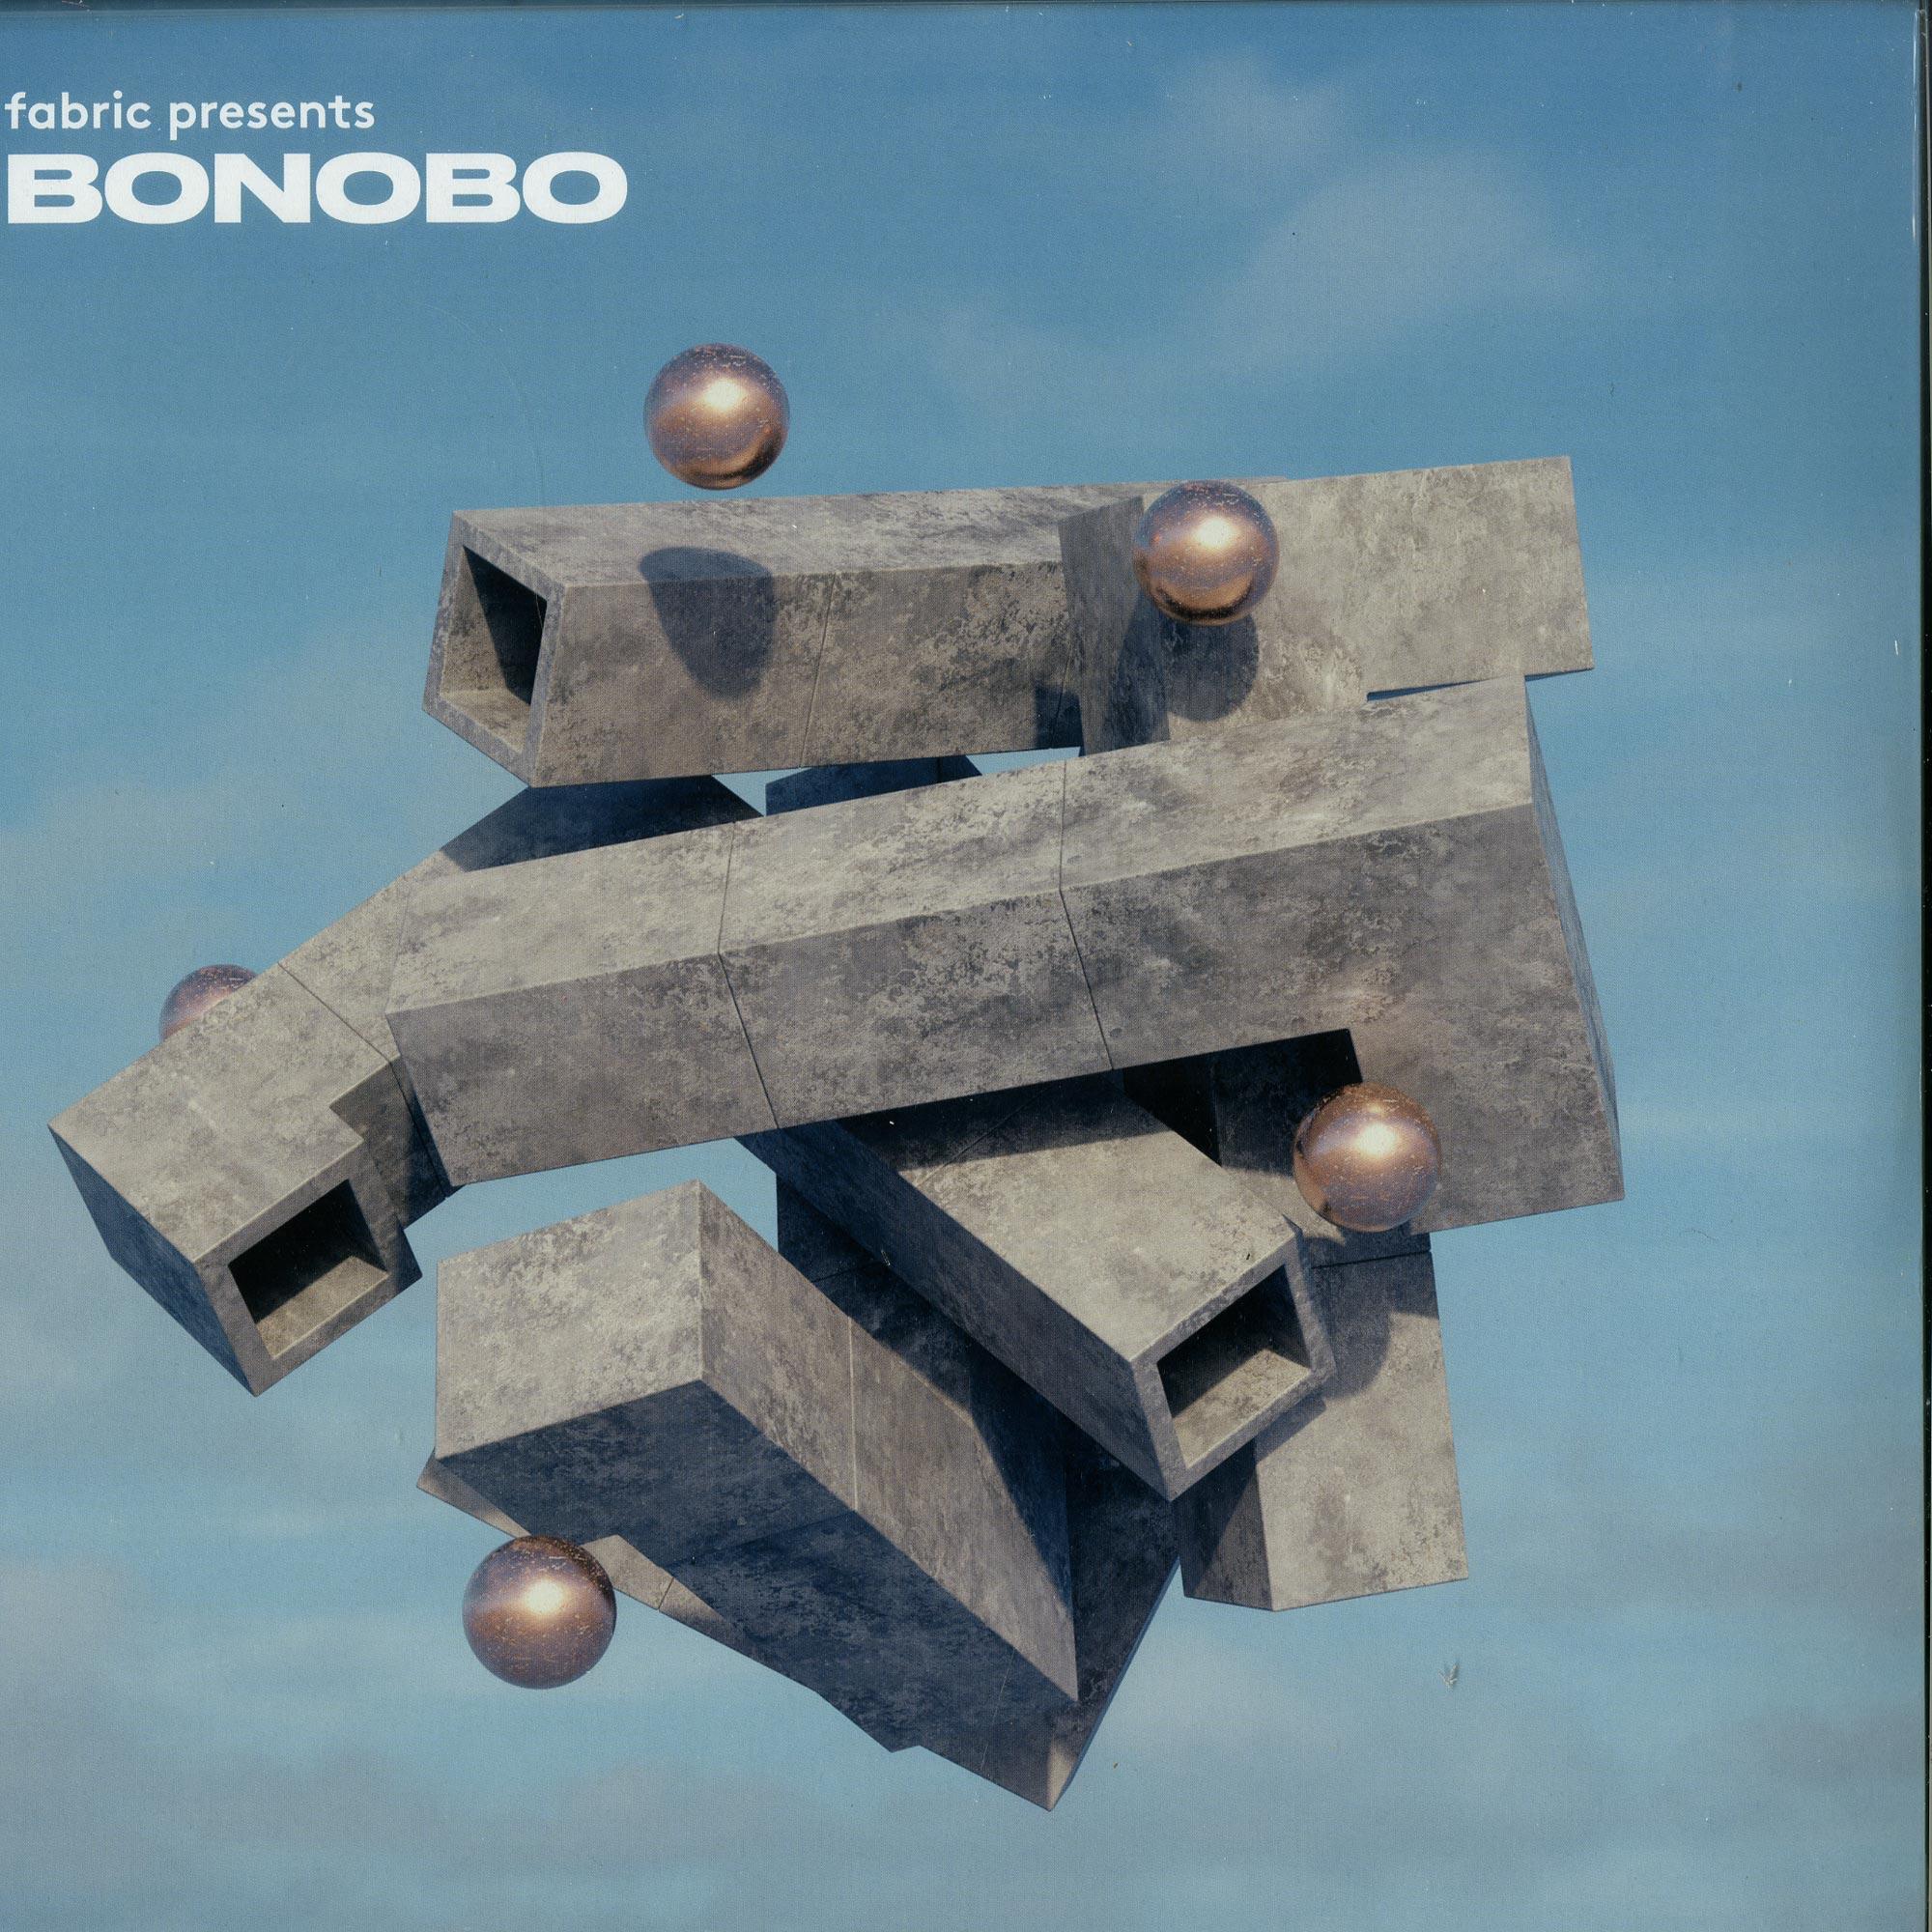 Bonobo - FABRIC PRESENTS: BONOBO